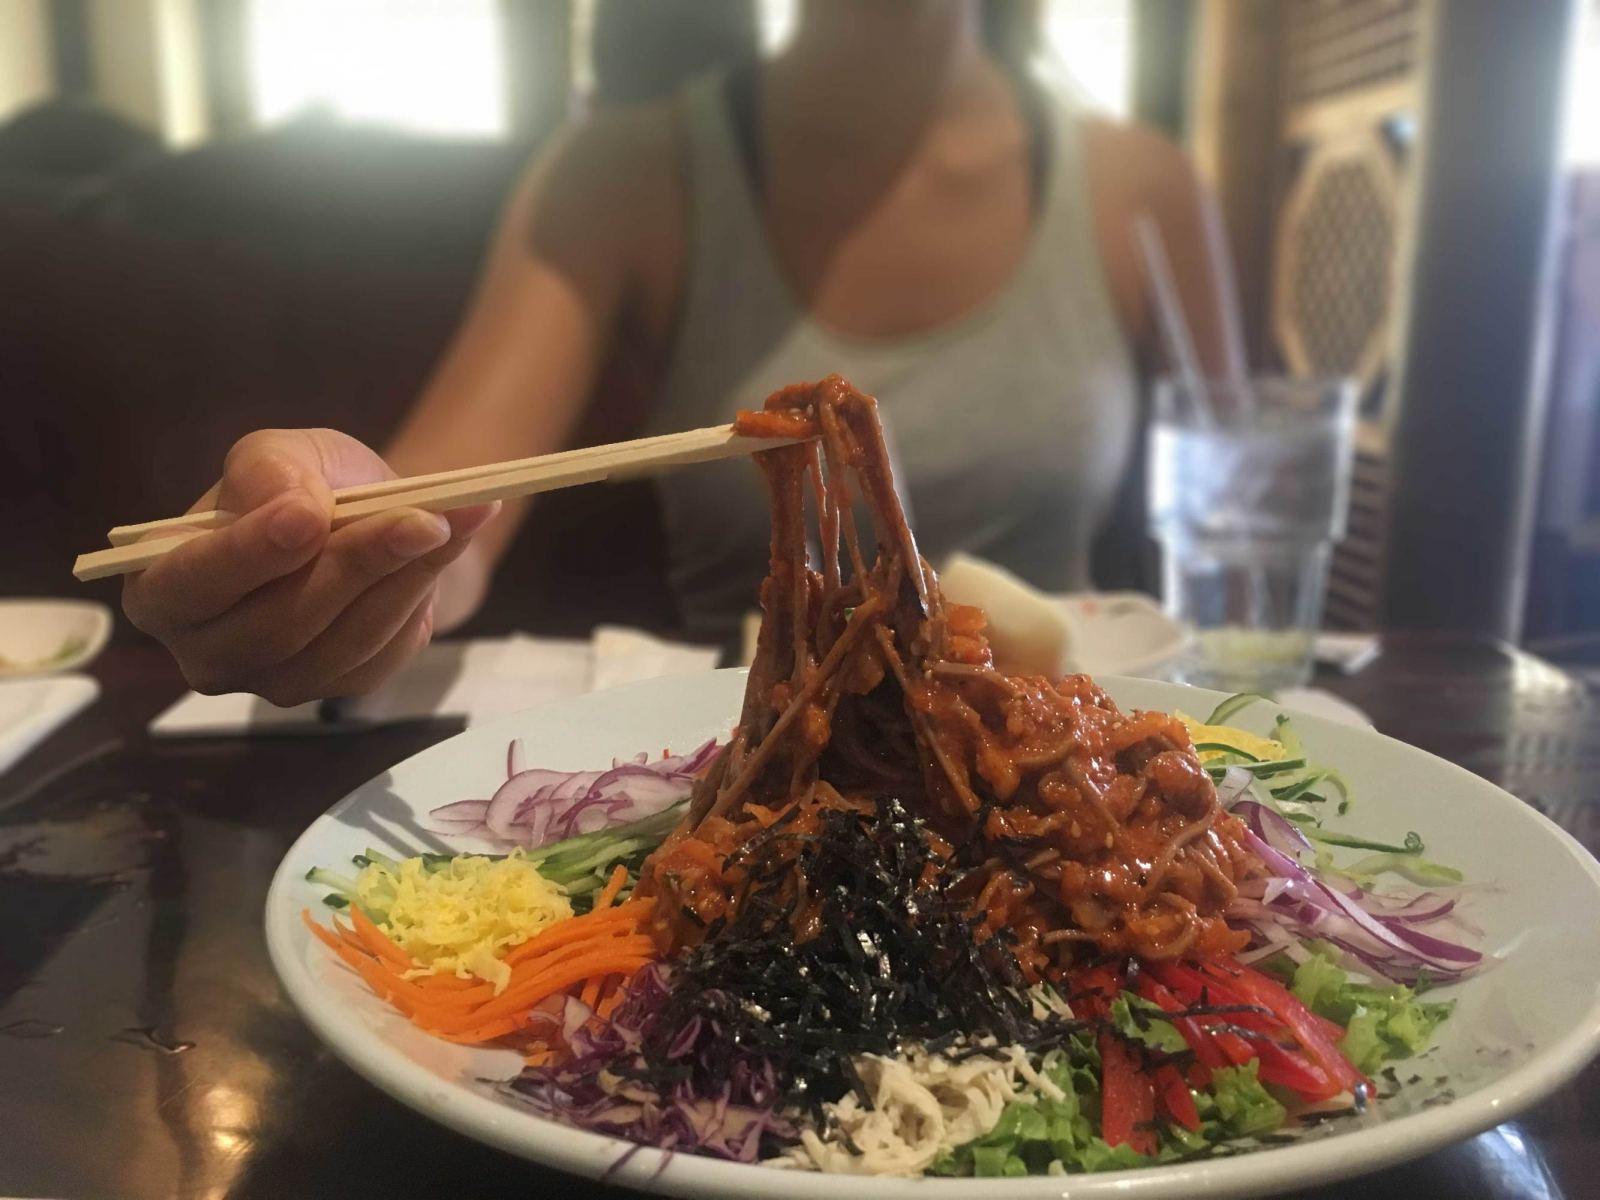 Avital-Ungar.-Koreatown-Food-Tour.-Kobawoo-House-Acorn-Noodles-Blurred